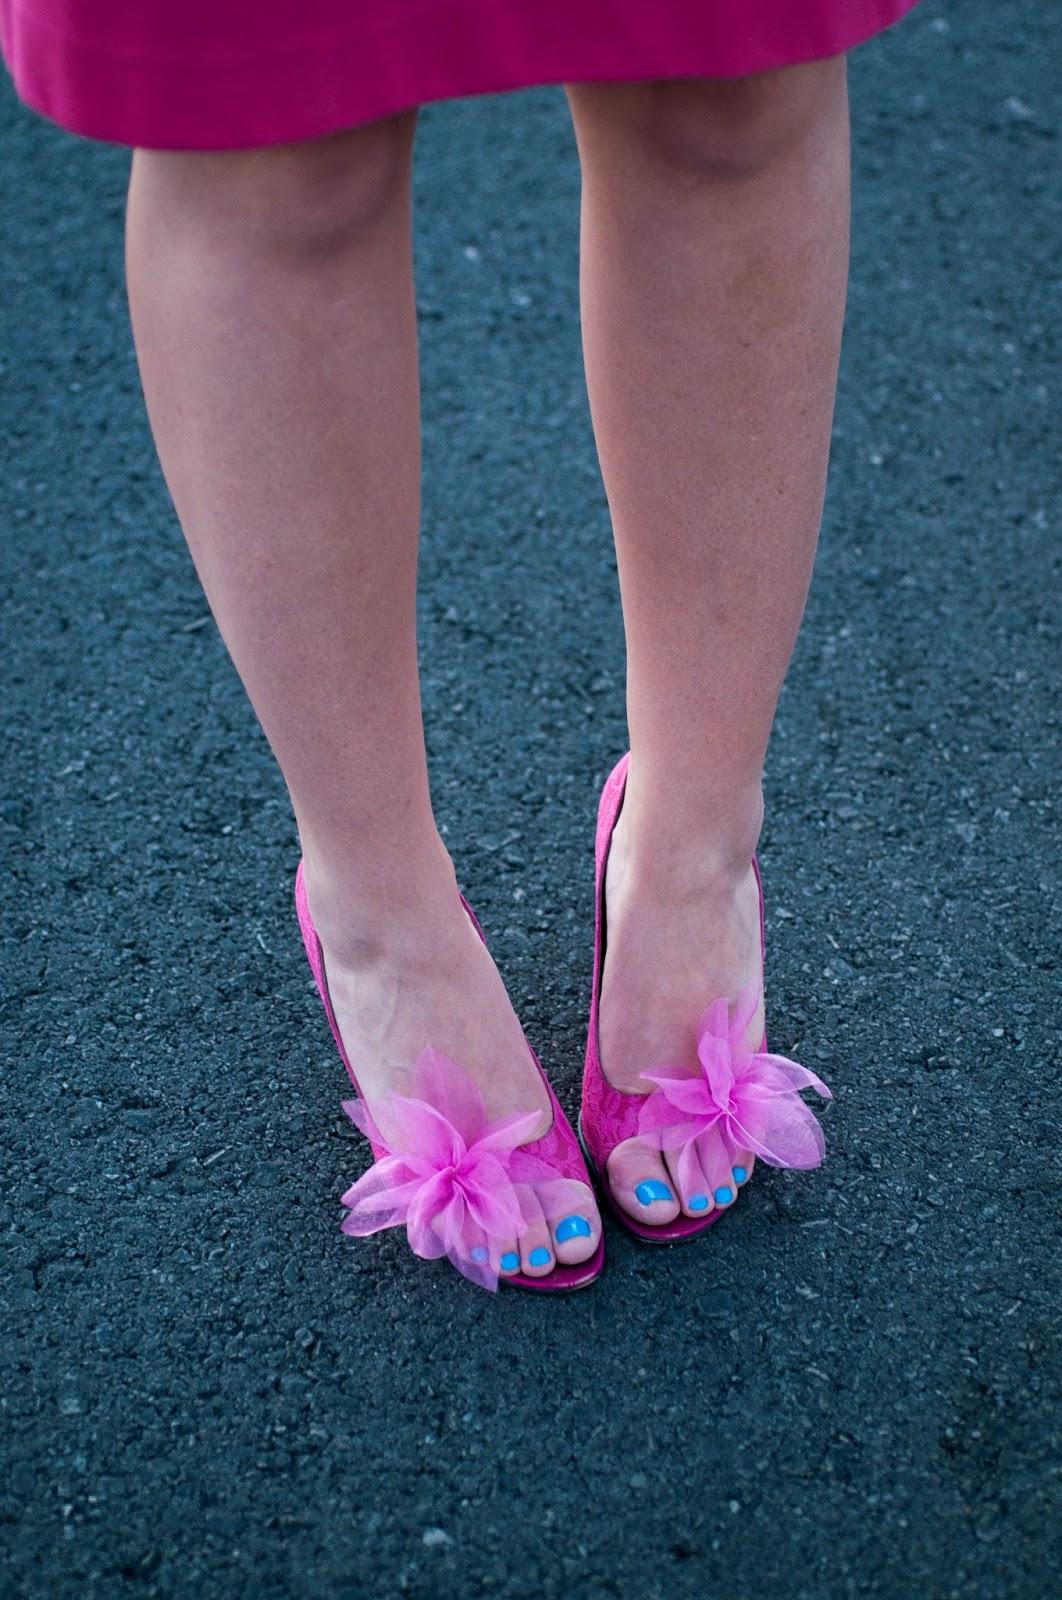 bebe, bebe shoes, flower shoes, lace shoes, hot pink heels, hot pink shoes, designer shoes, ootd